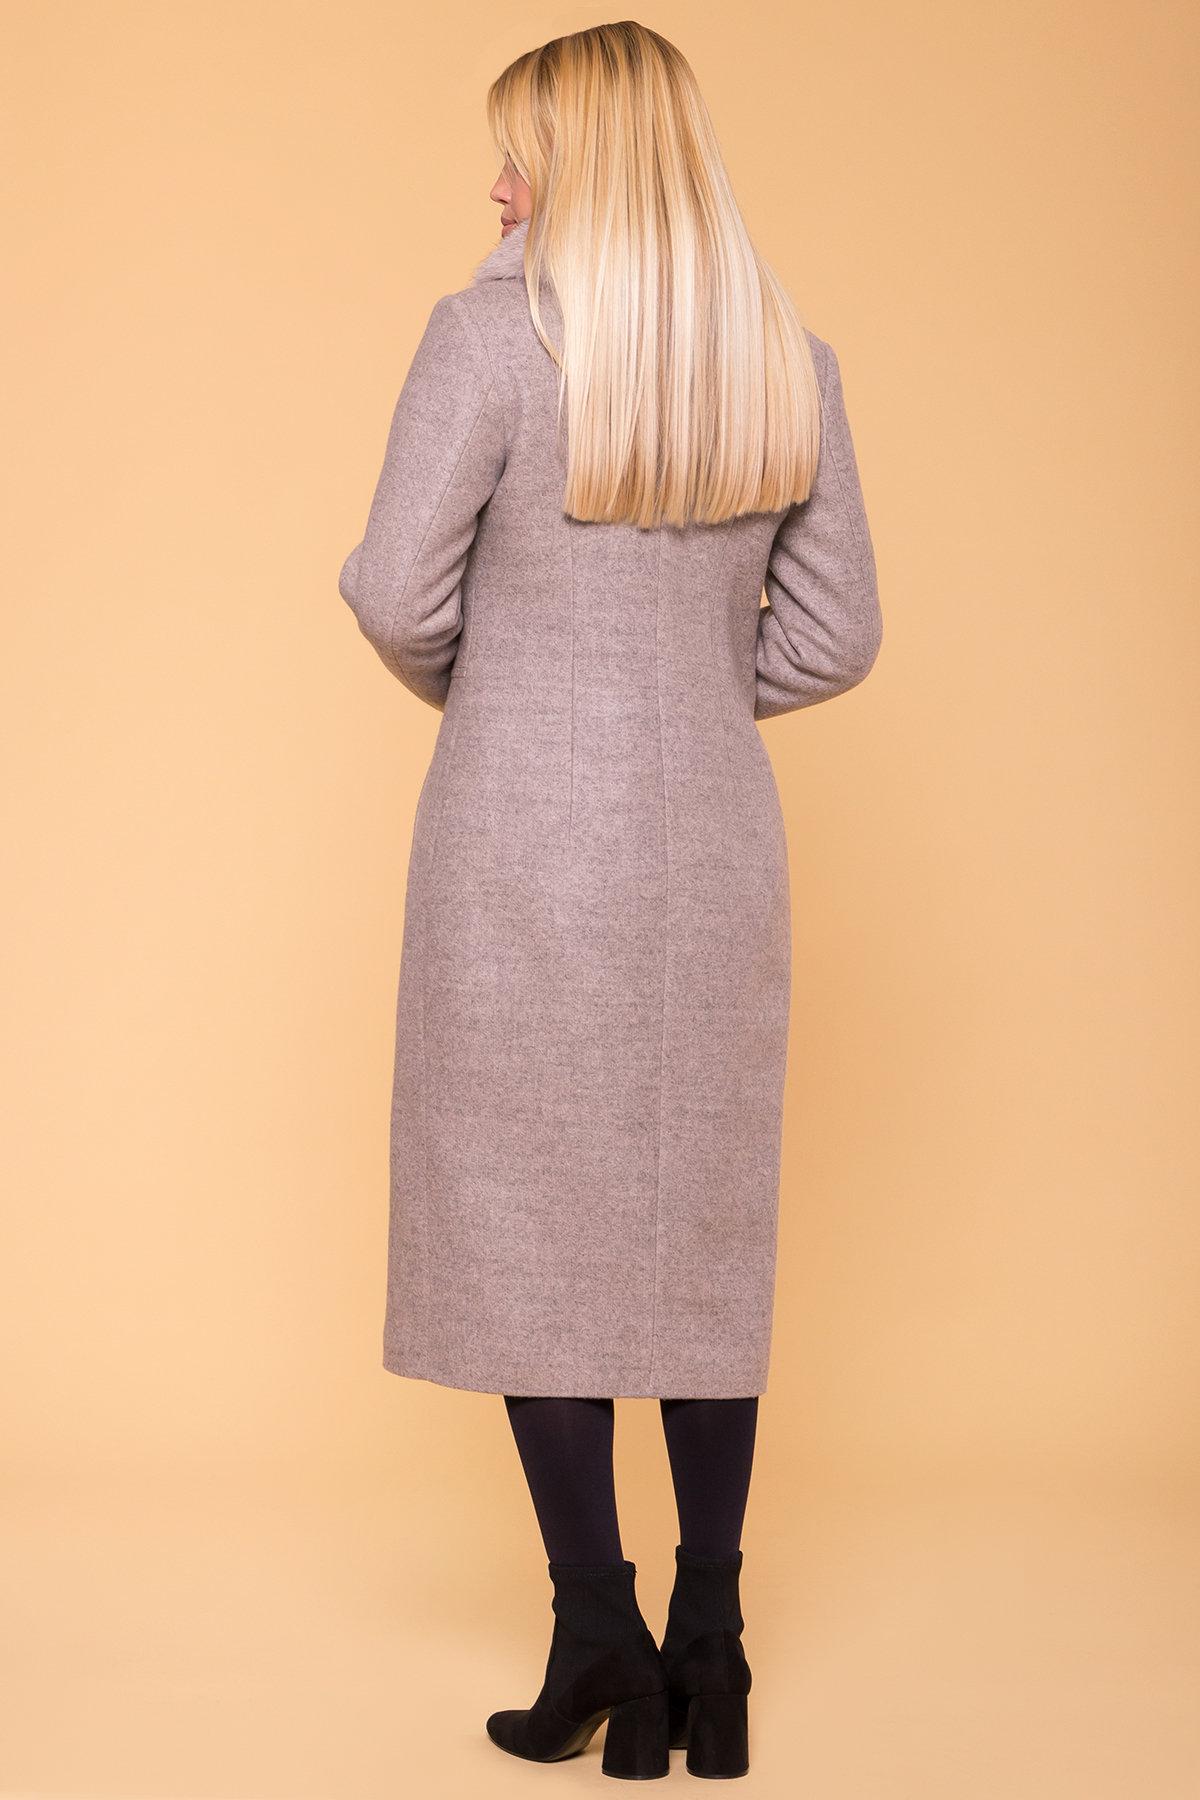 Пальто зима Габриэлла макси 5890 АРТ. 39456 Цвет: Бежевый 31 - фото 2, интернет магазин tm-modus.ru